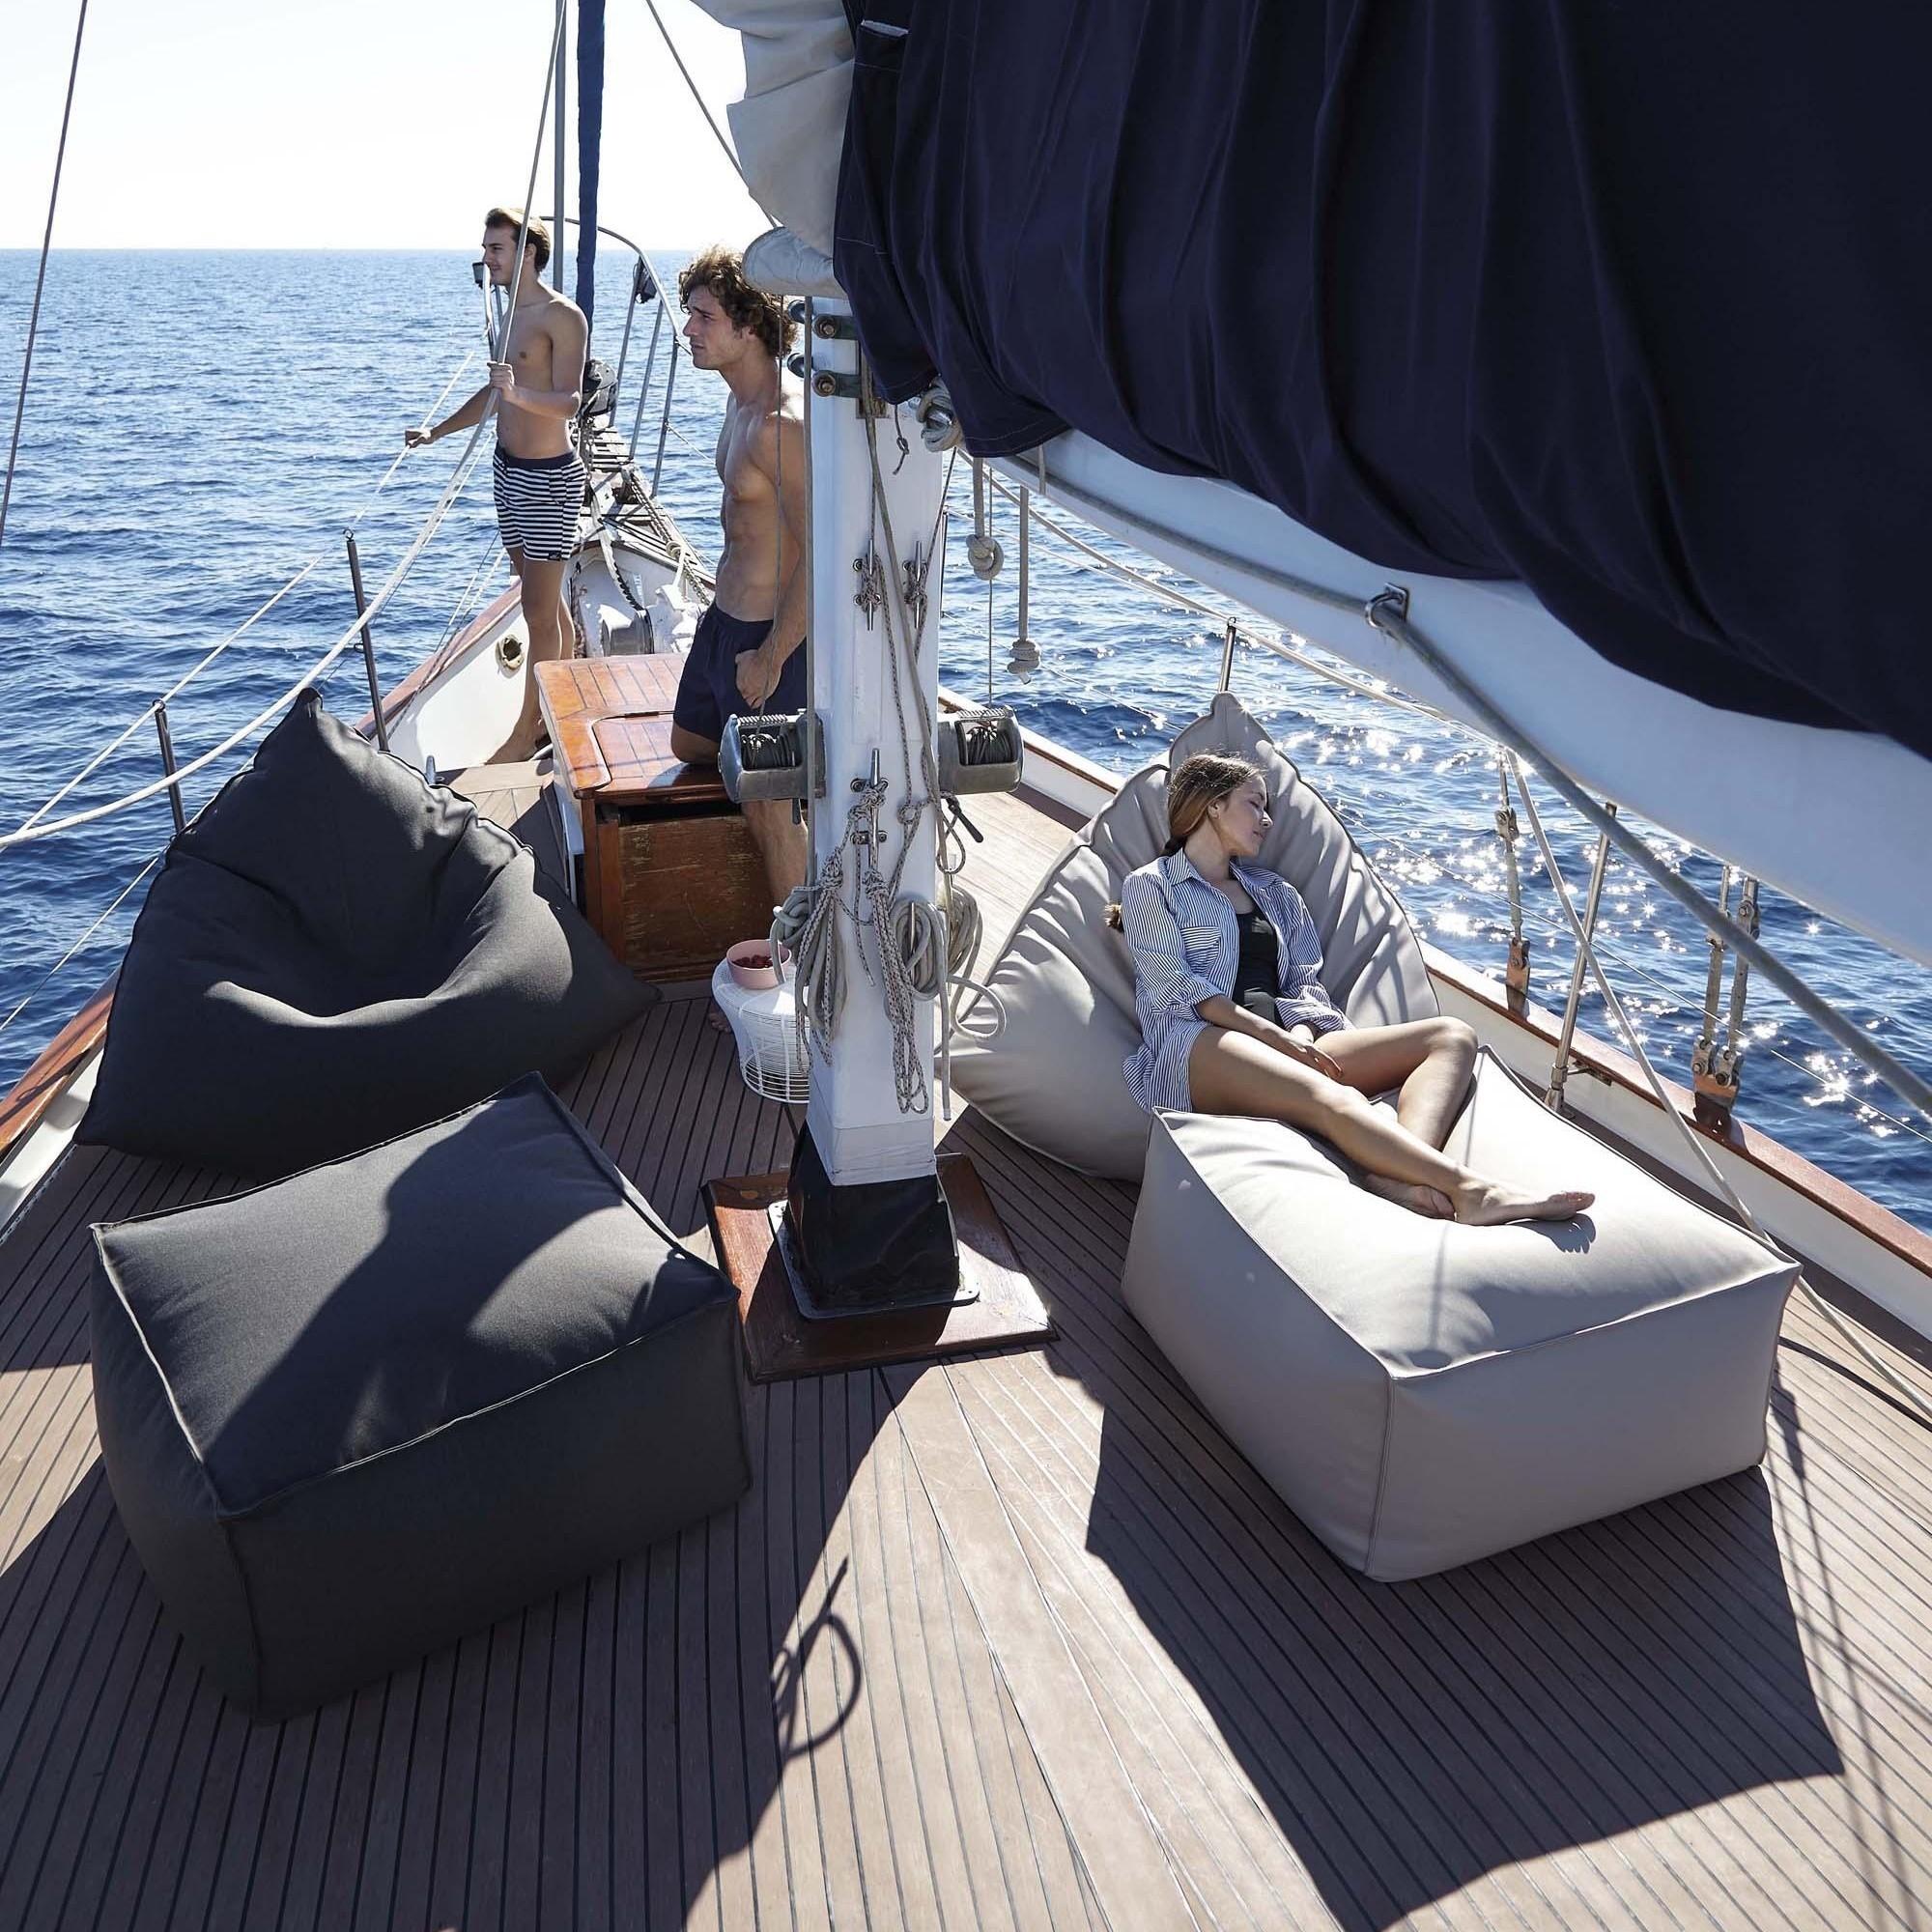 Gandia blasco sail outdoor puf ambientedirect - Gandia blasco precios ...